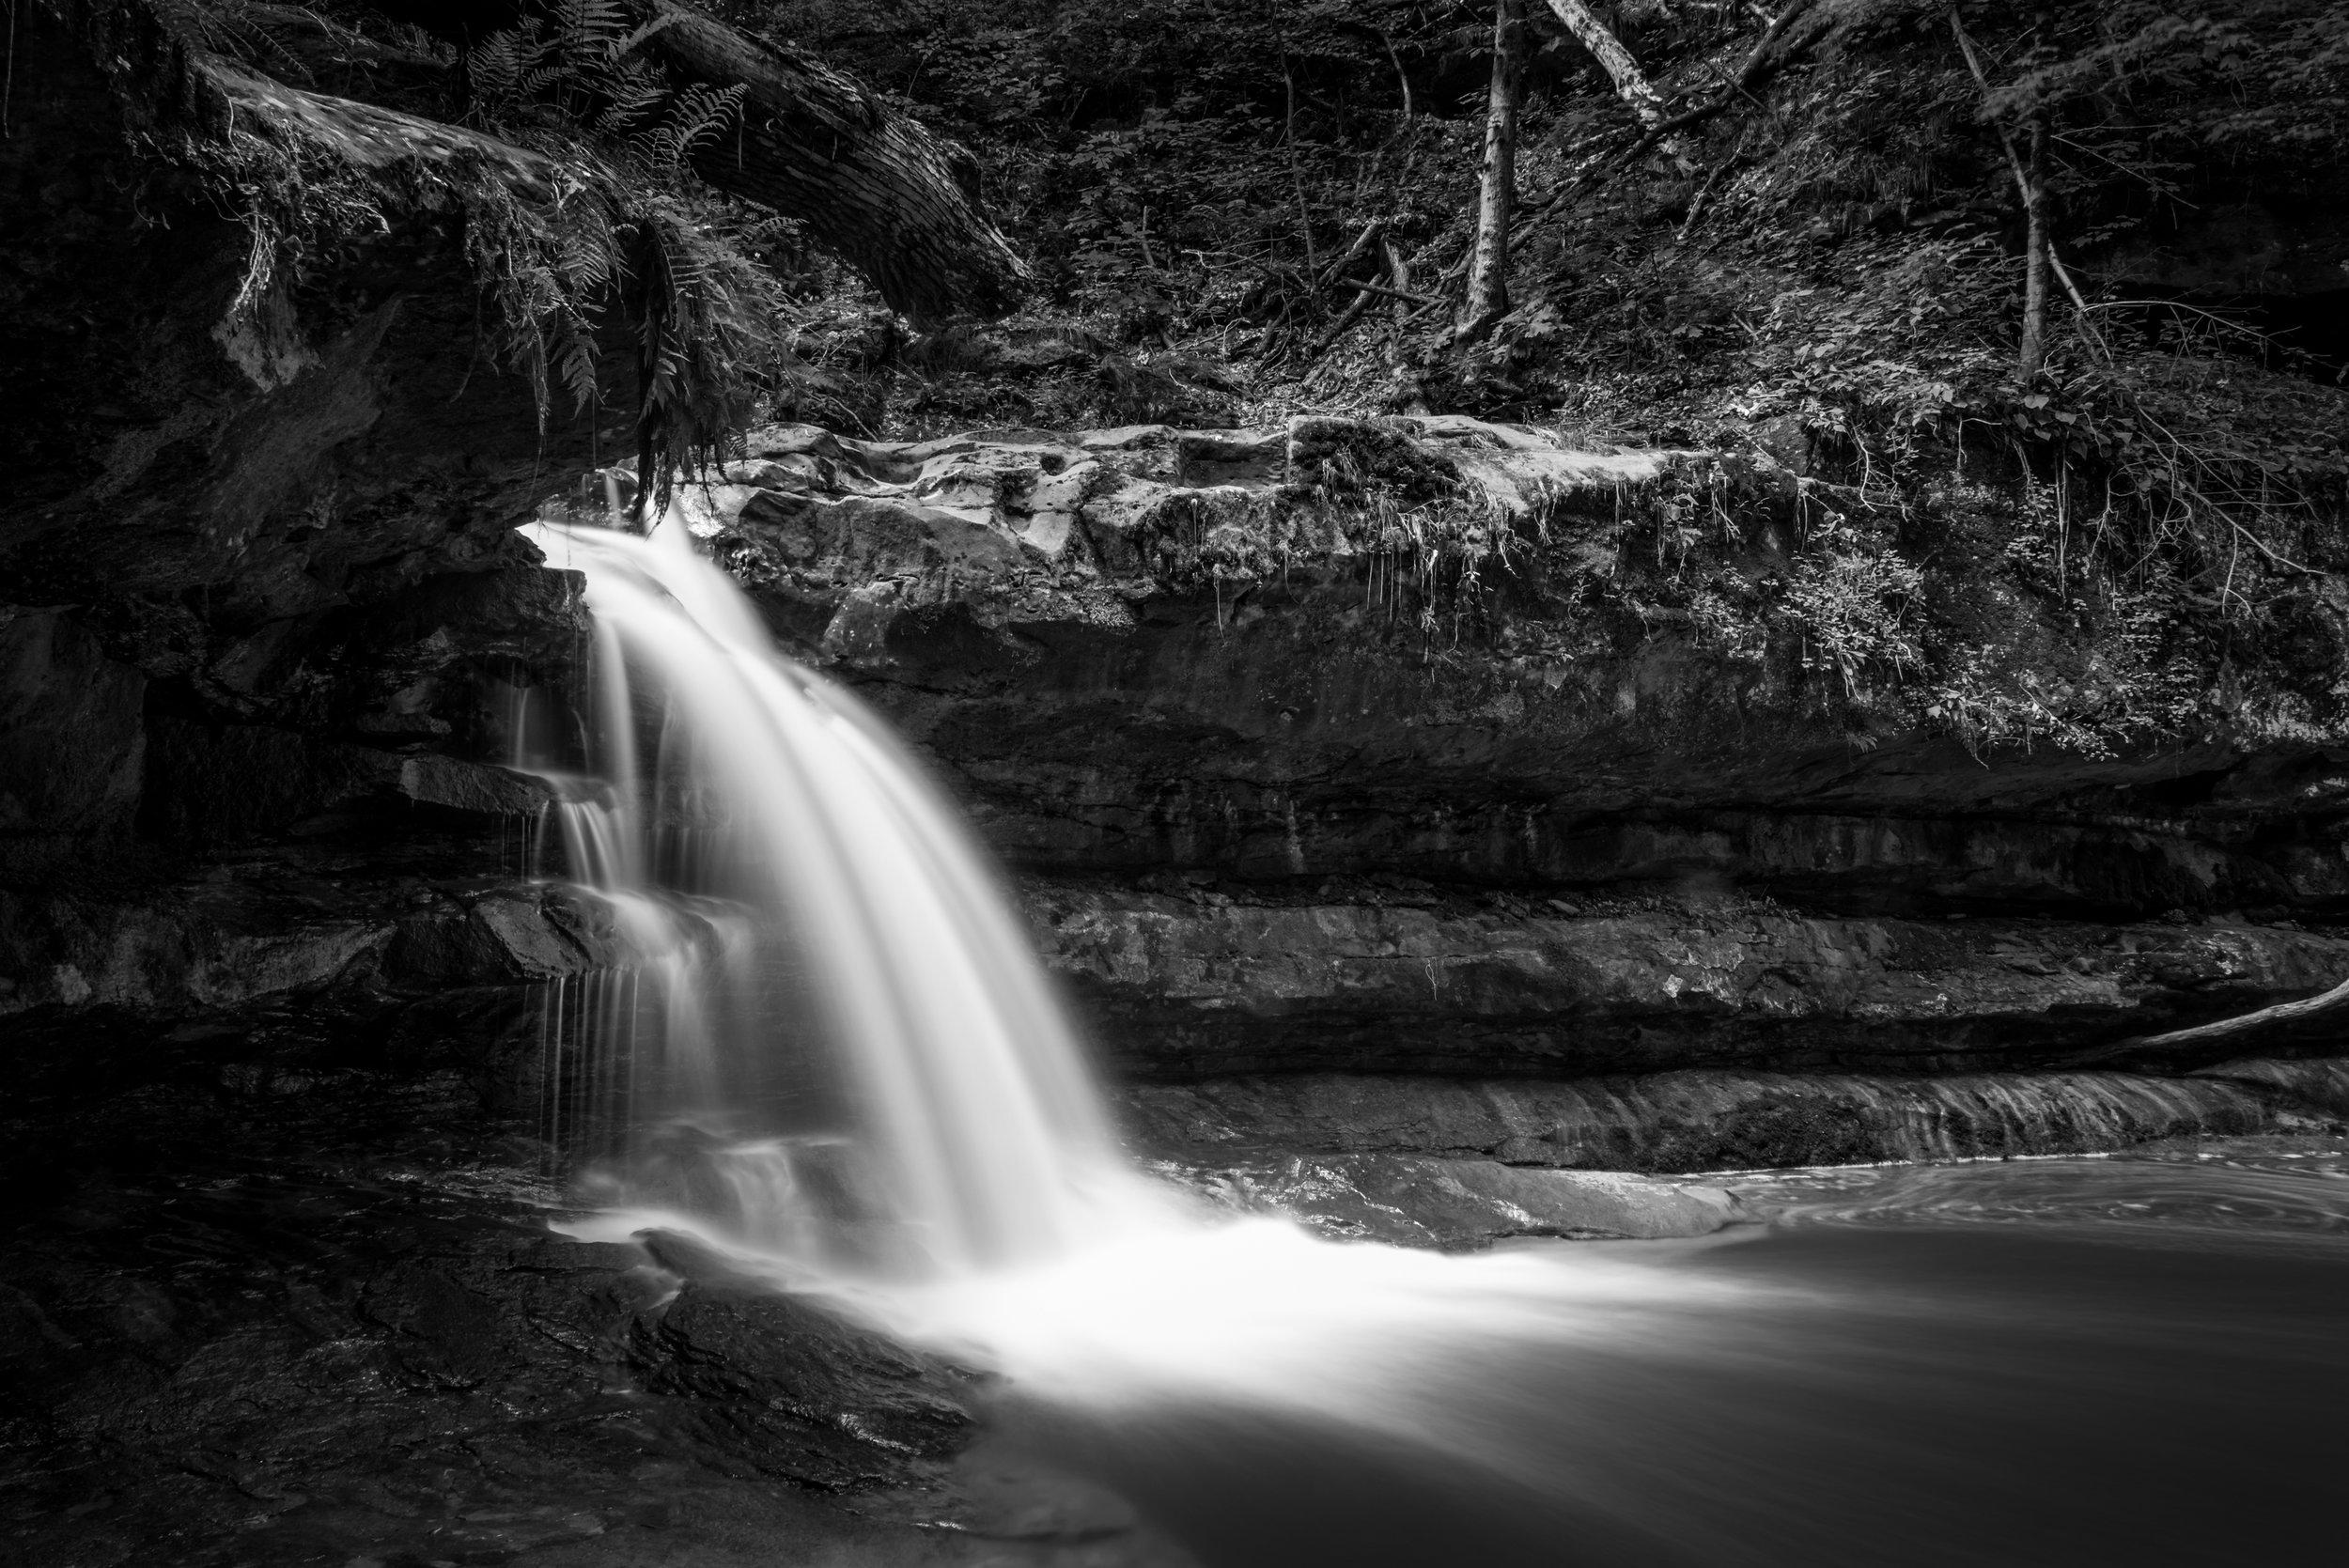 Flemmings Falls - Camp Mowana (Mansfield, Ohio)